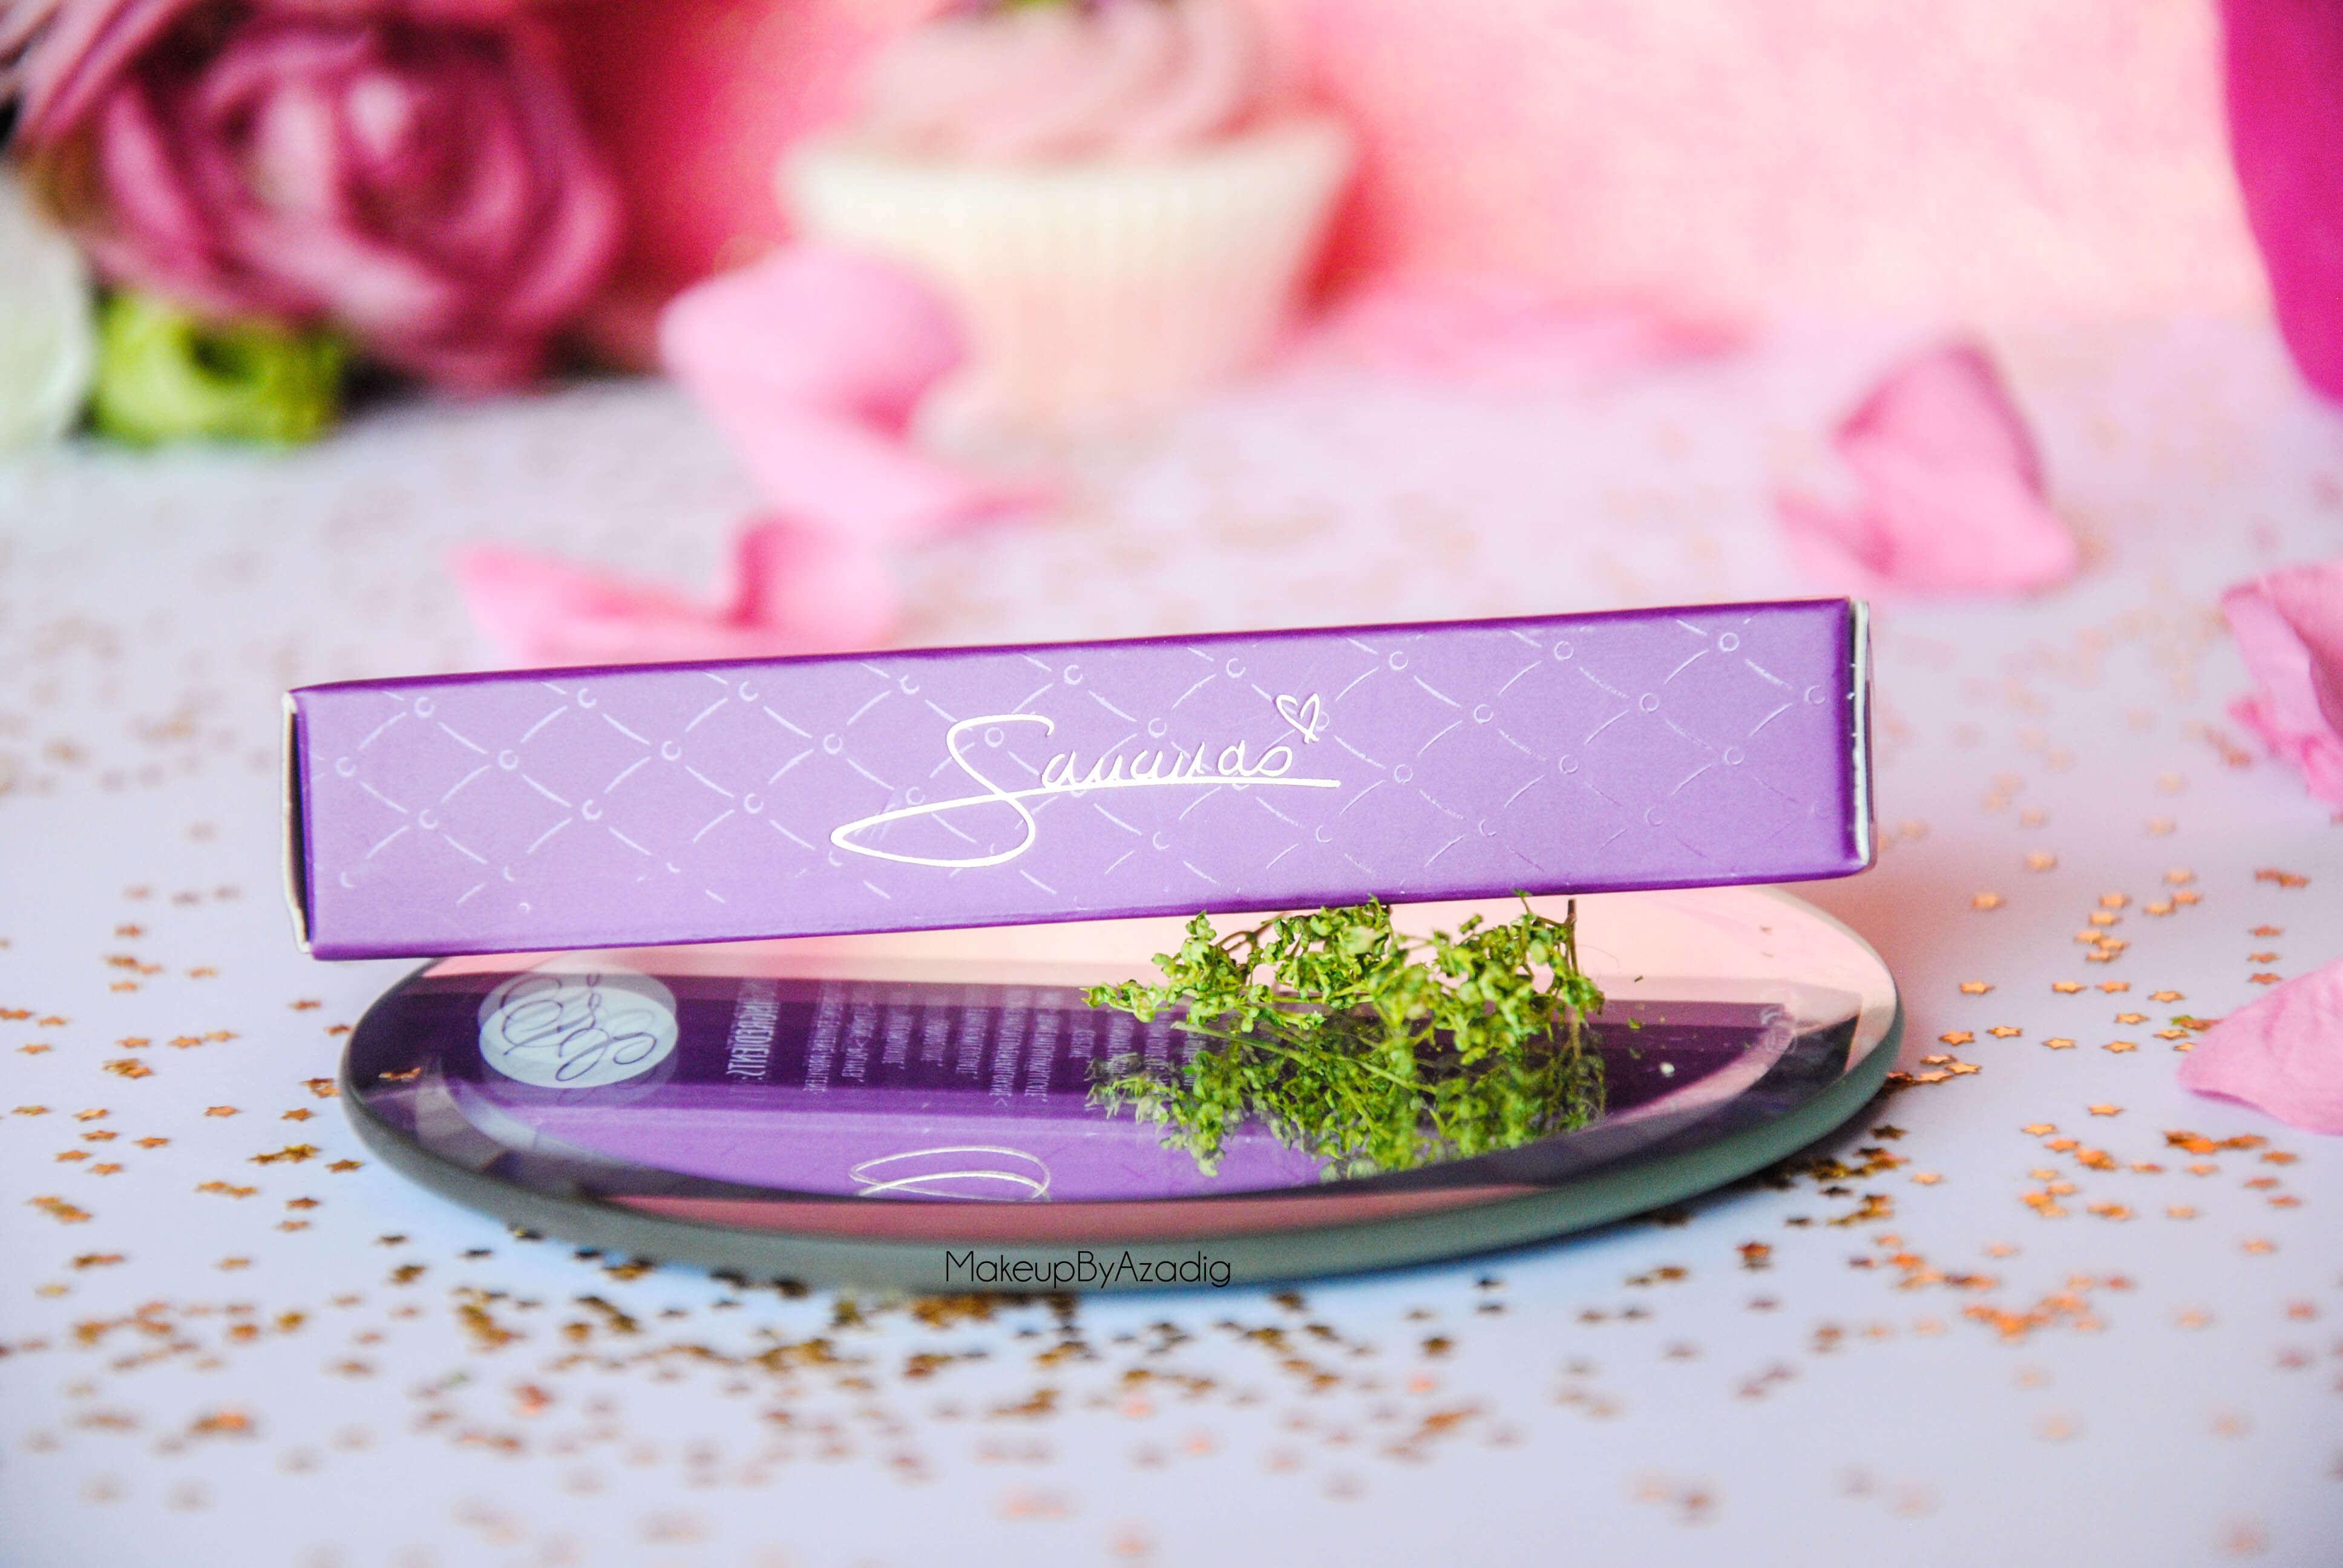 makeupbyazadig-djulicious-cosmetics-sananas-peekabooo-knoetzie-natacha-birds-julie-world-of-beauty-booolicious-sanoulicious-paris-troyes-dijon-dulcematte-revue-violet